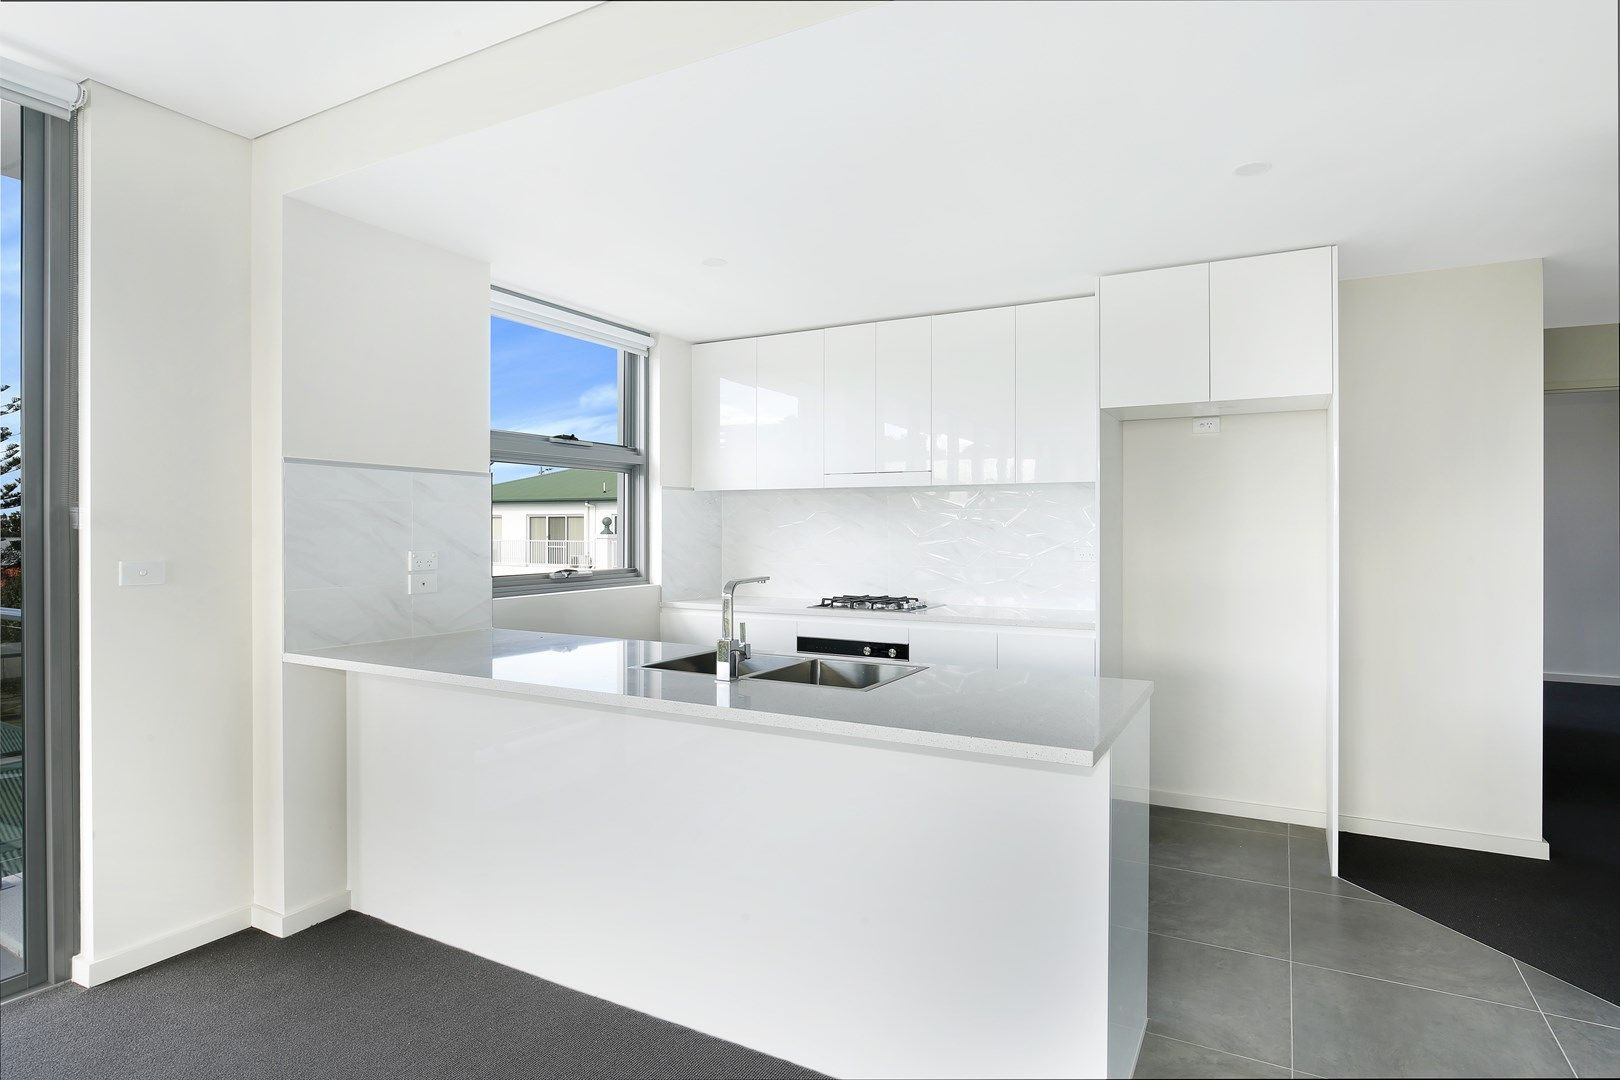 13/61 Keira  Street, Wollongong NSW 2500, Image 0